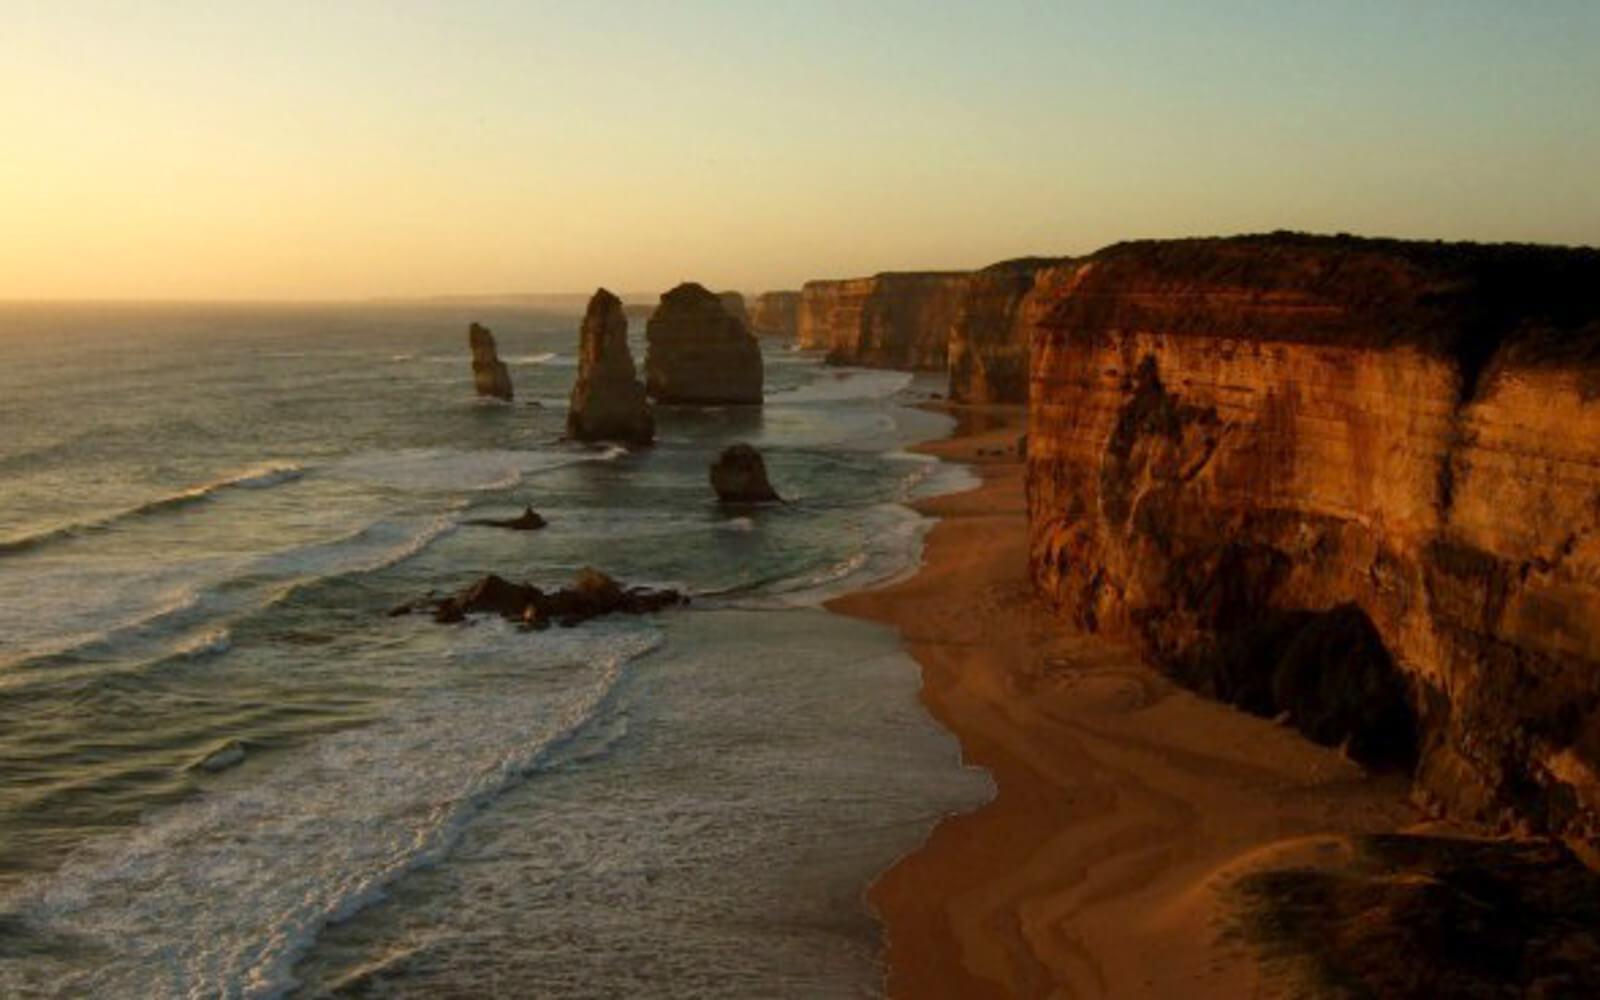 Steilküsten am Meer bei Sonnenuntergang